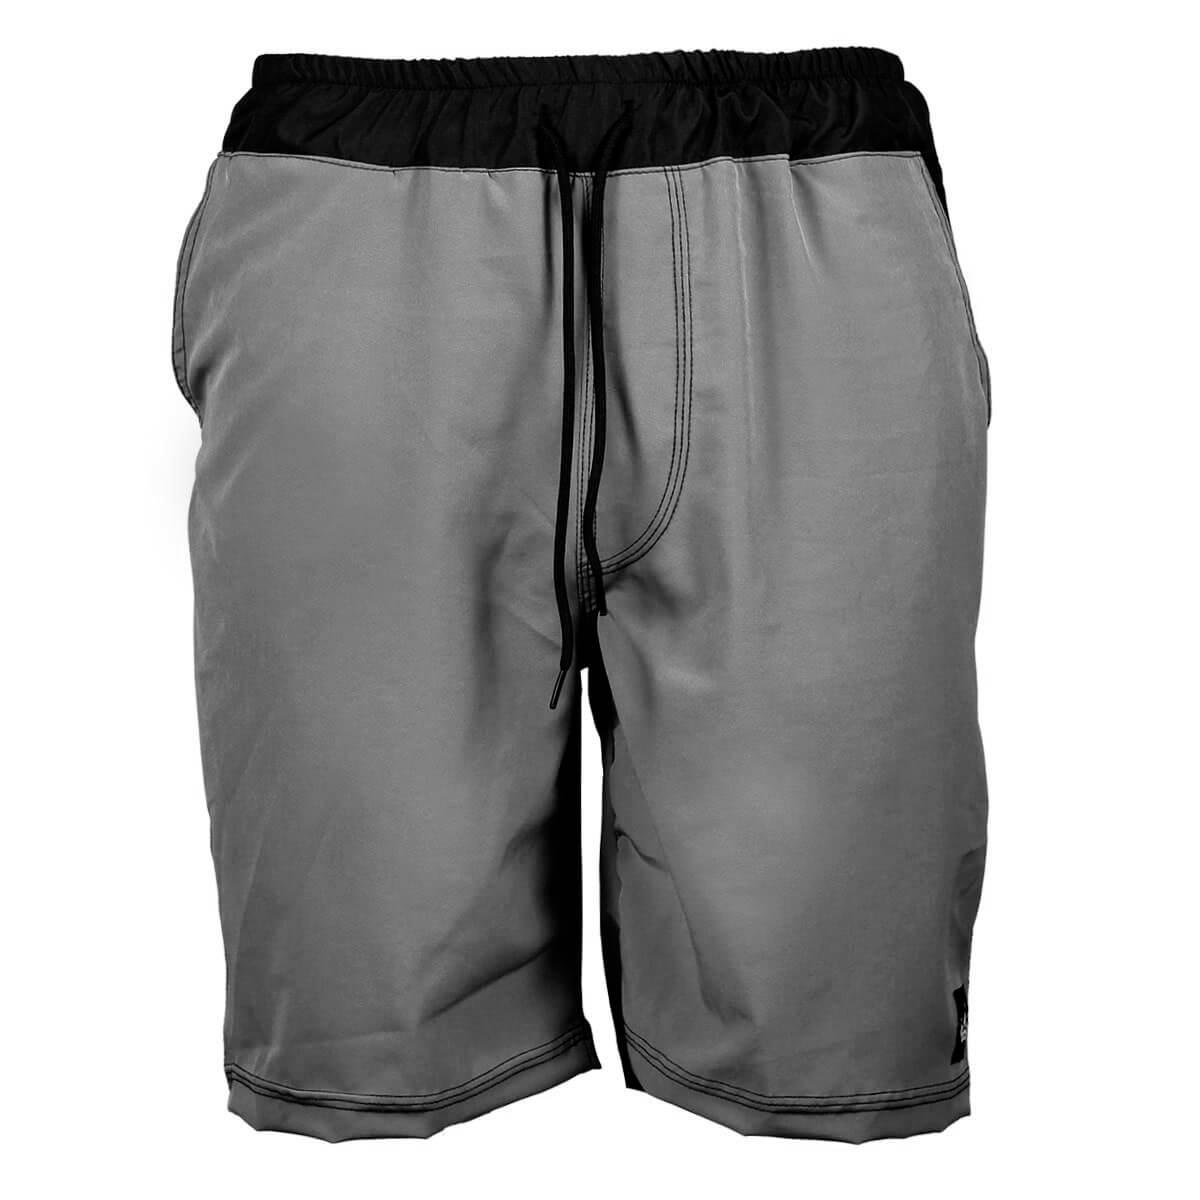 Bermuda Slim Fit Tech Hoshwear Cinza